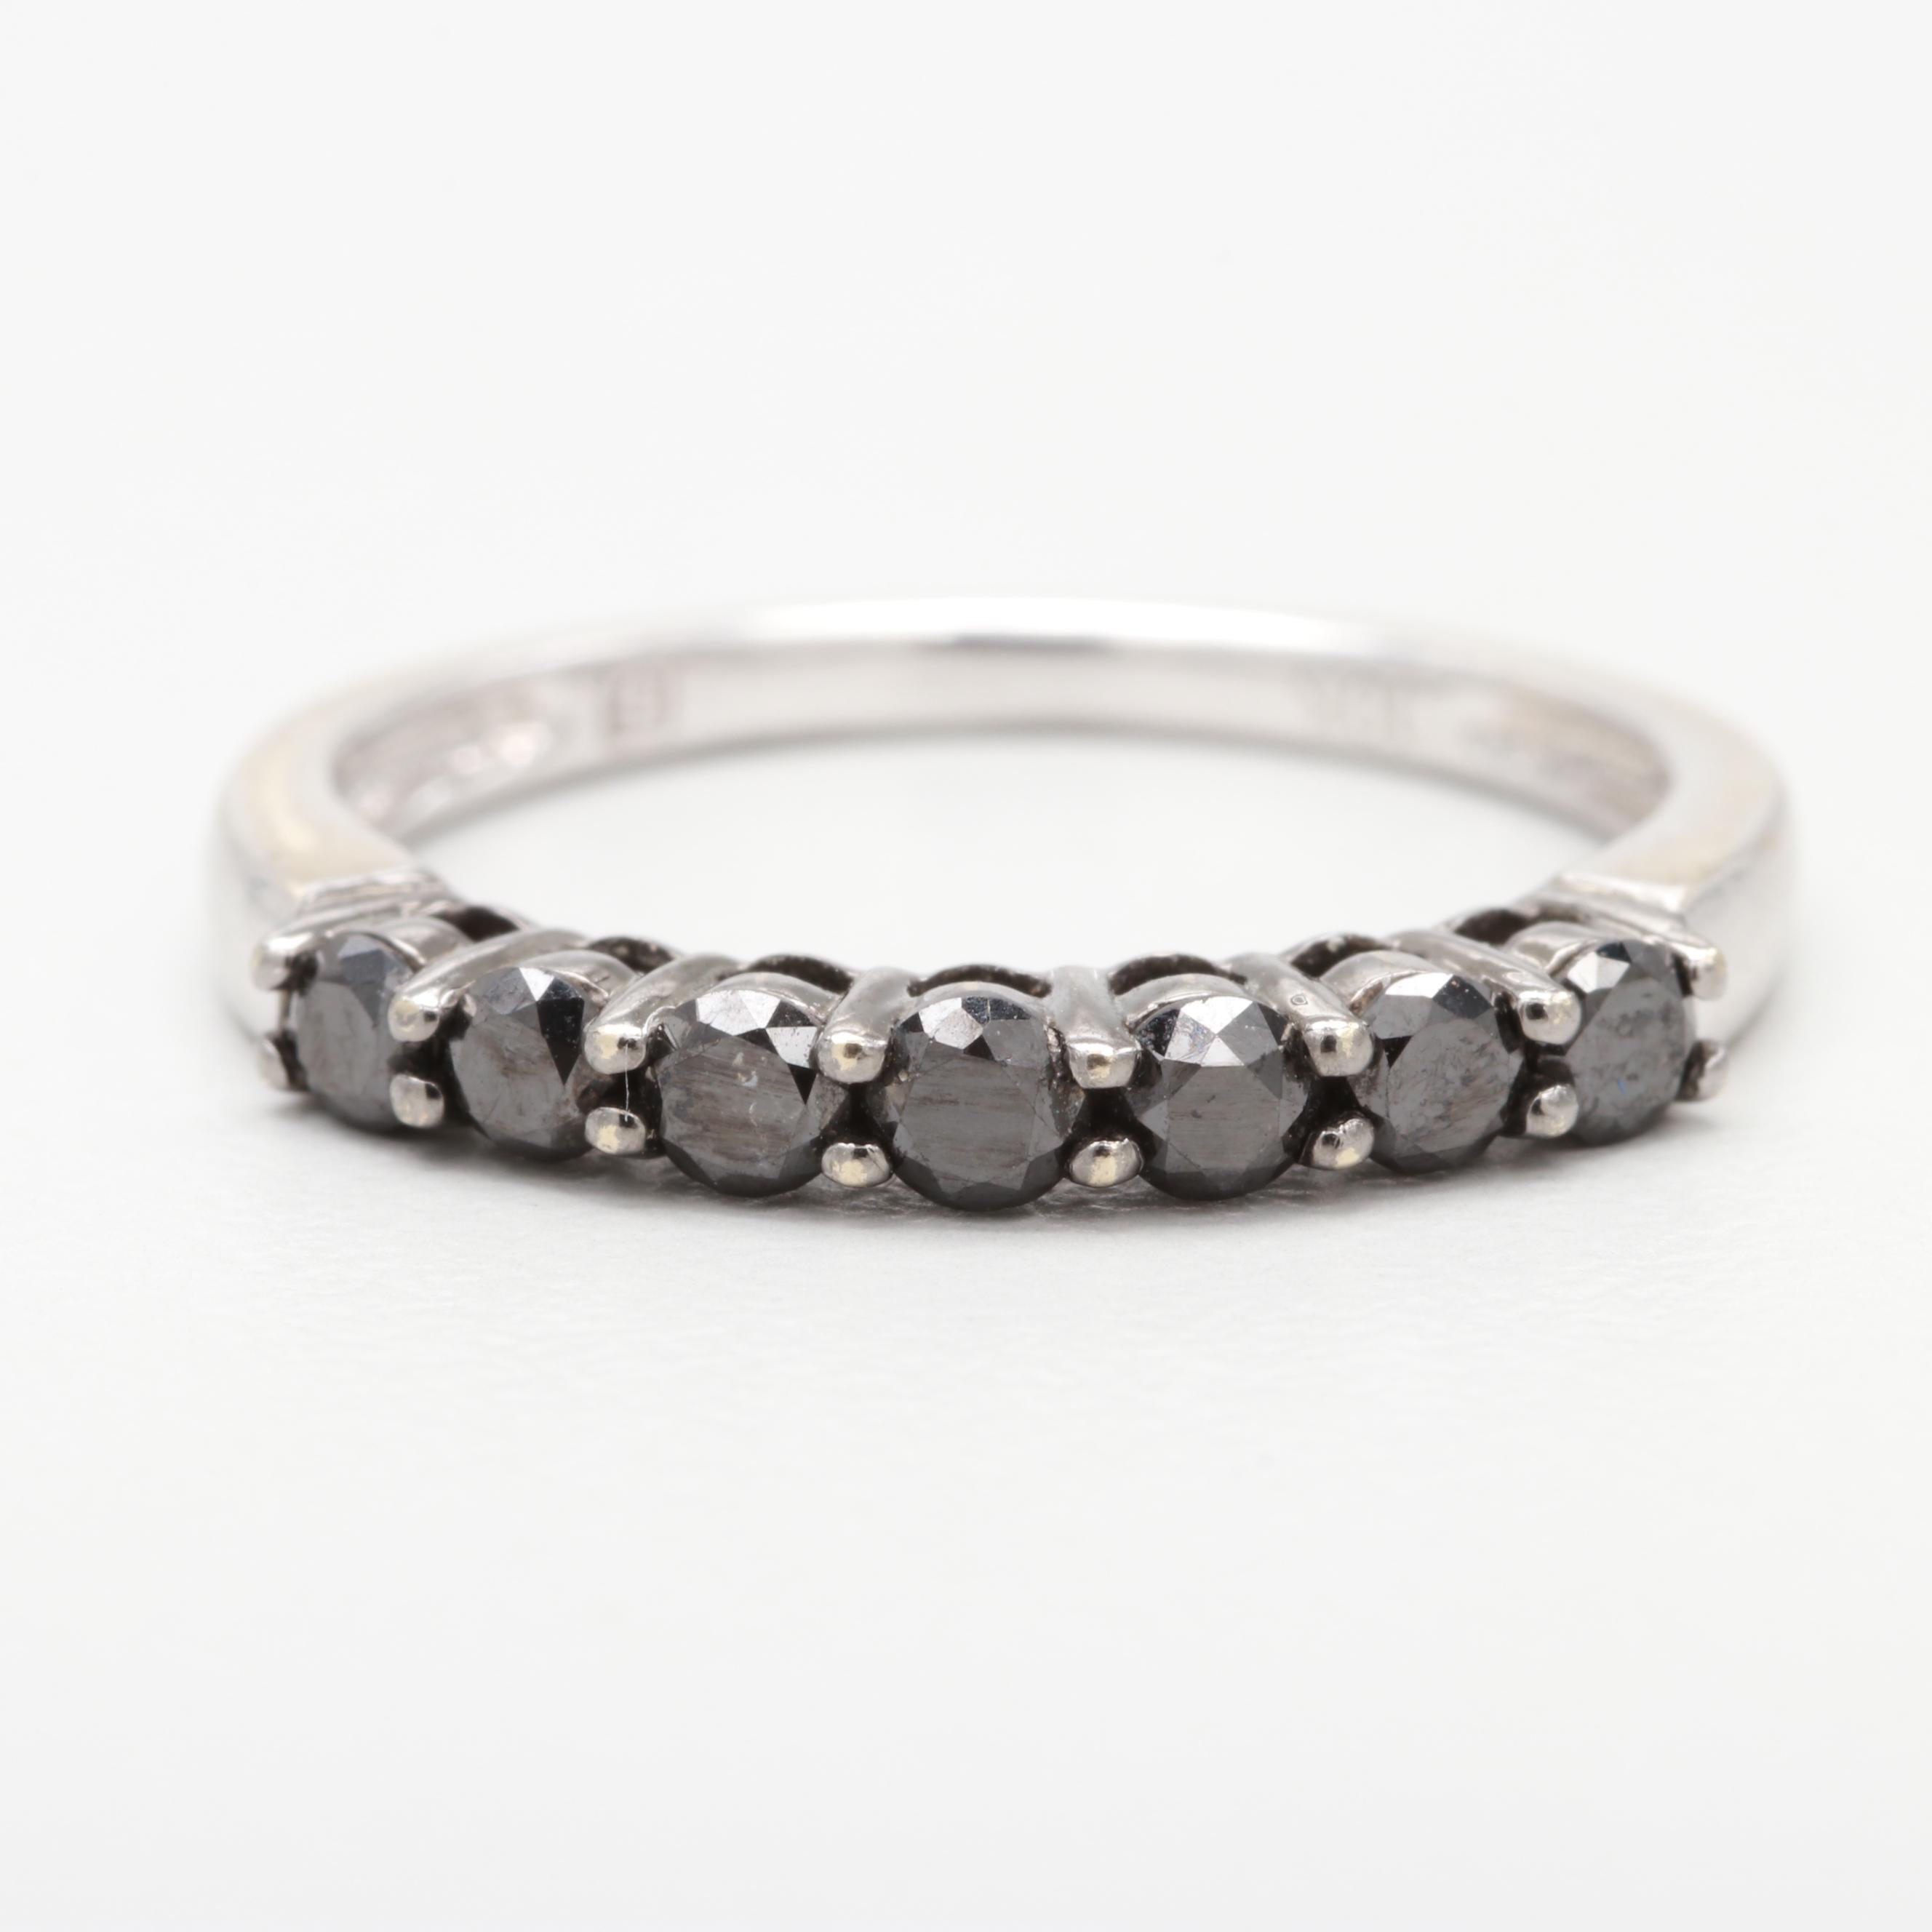 10K White Gold Black Diamond Ring